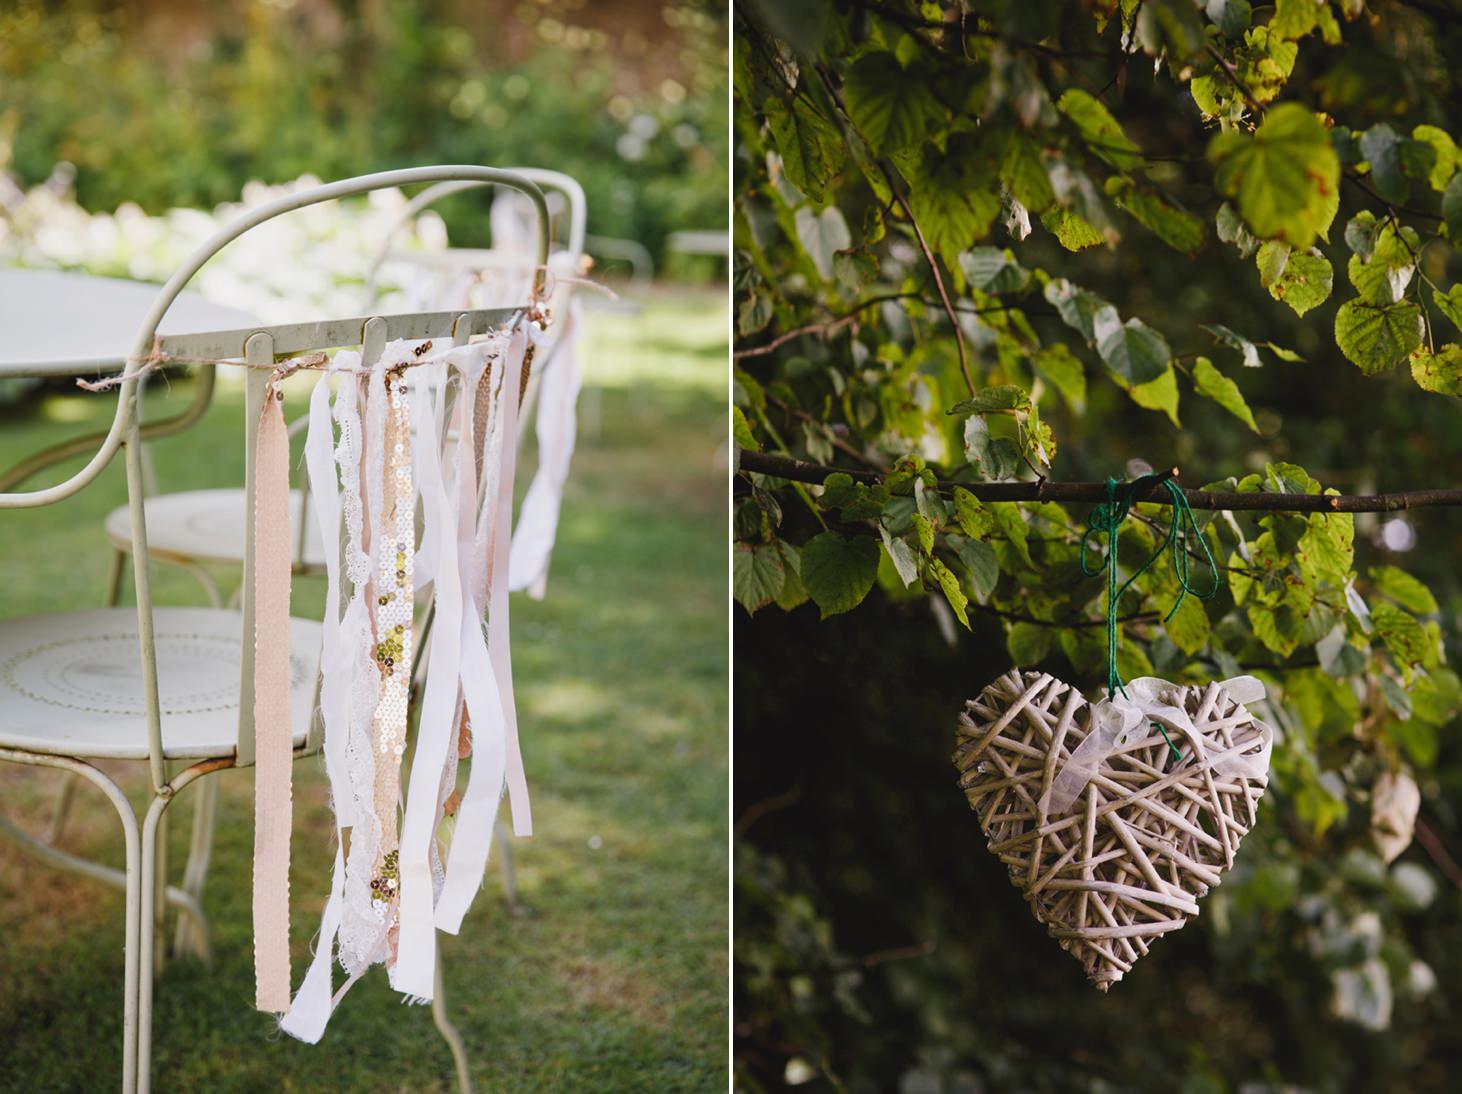 The Rectory Hotel wedding wedding chair decorations